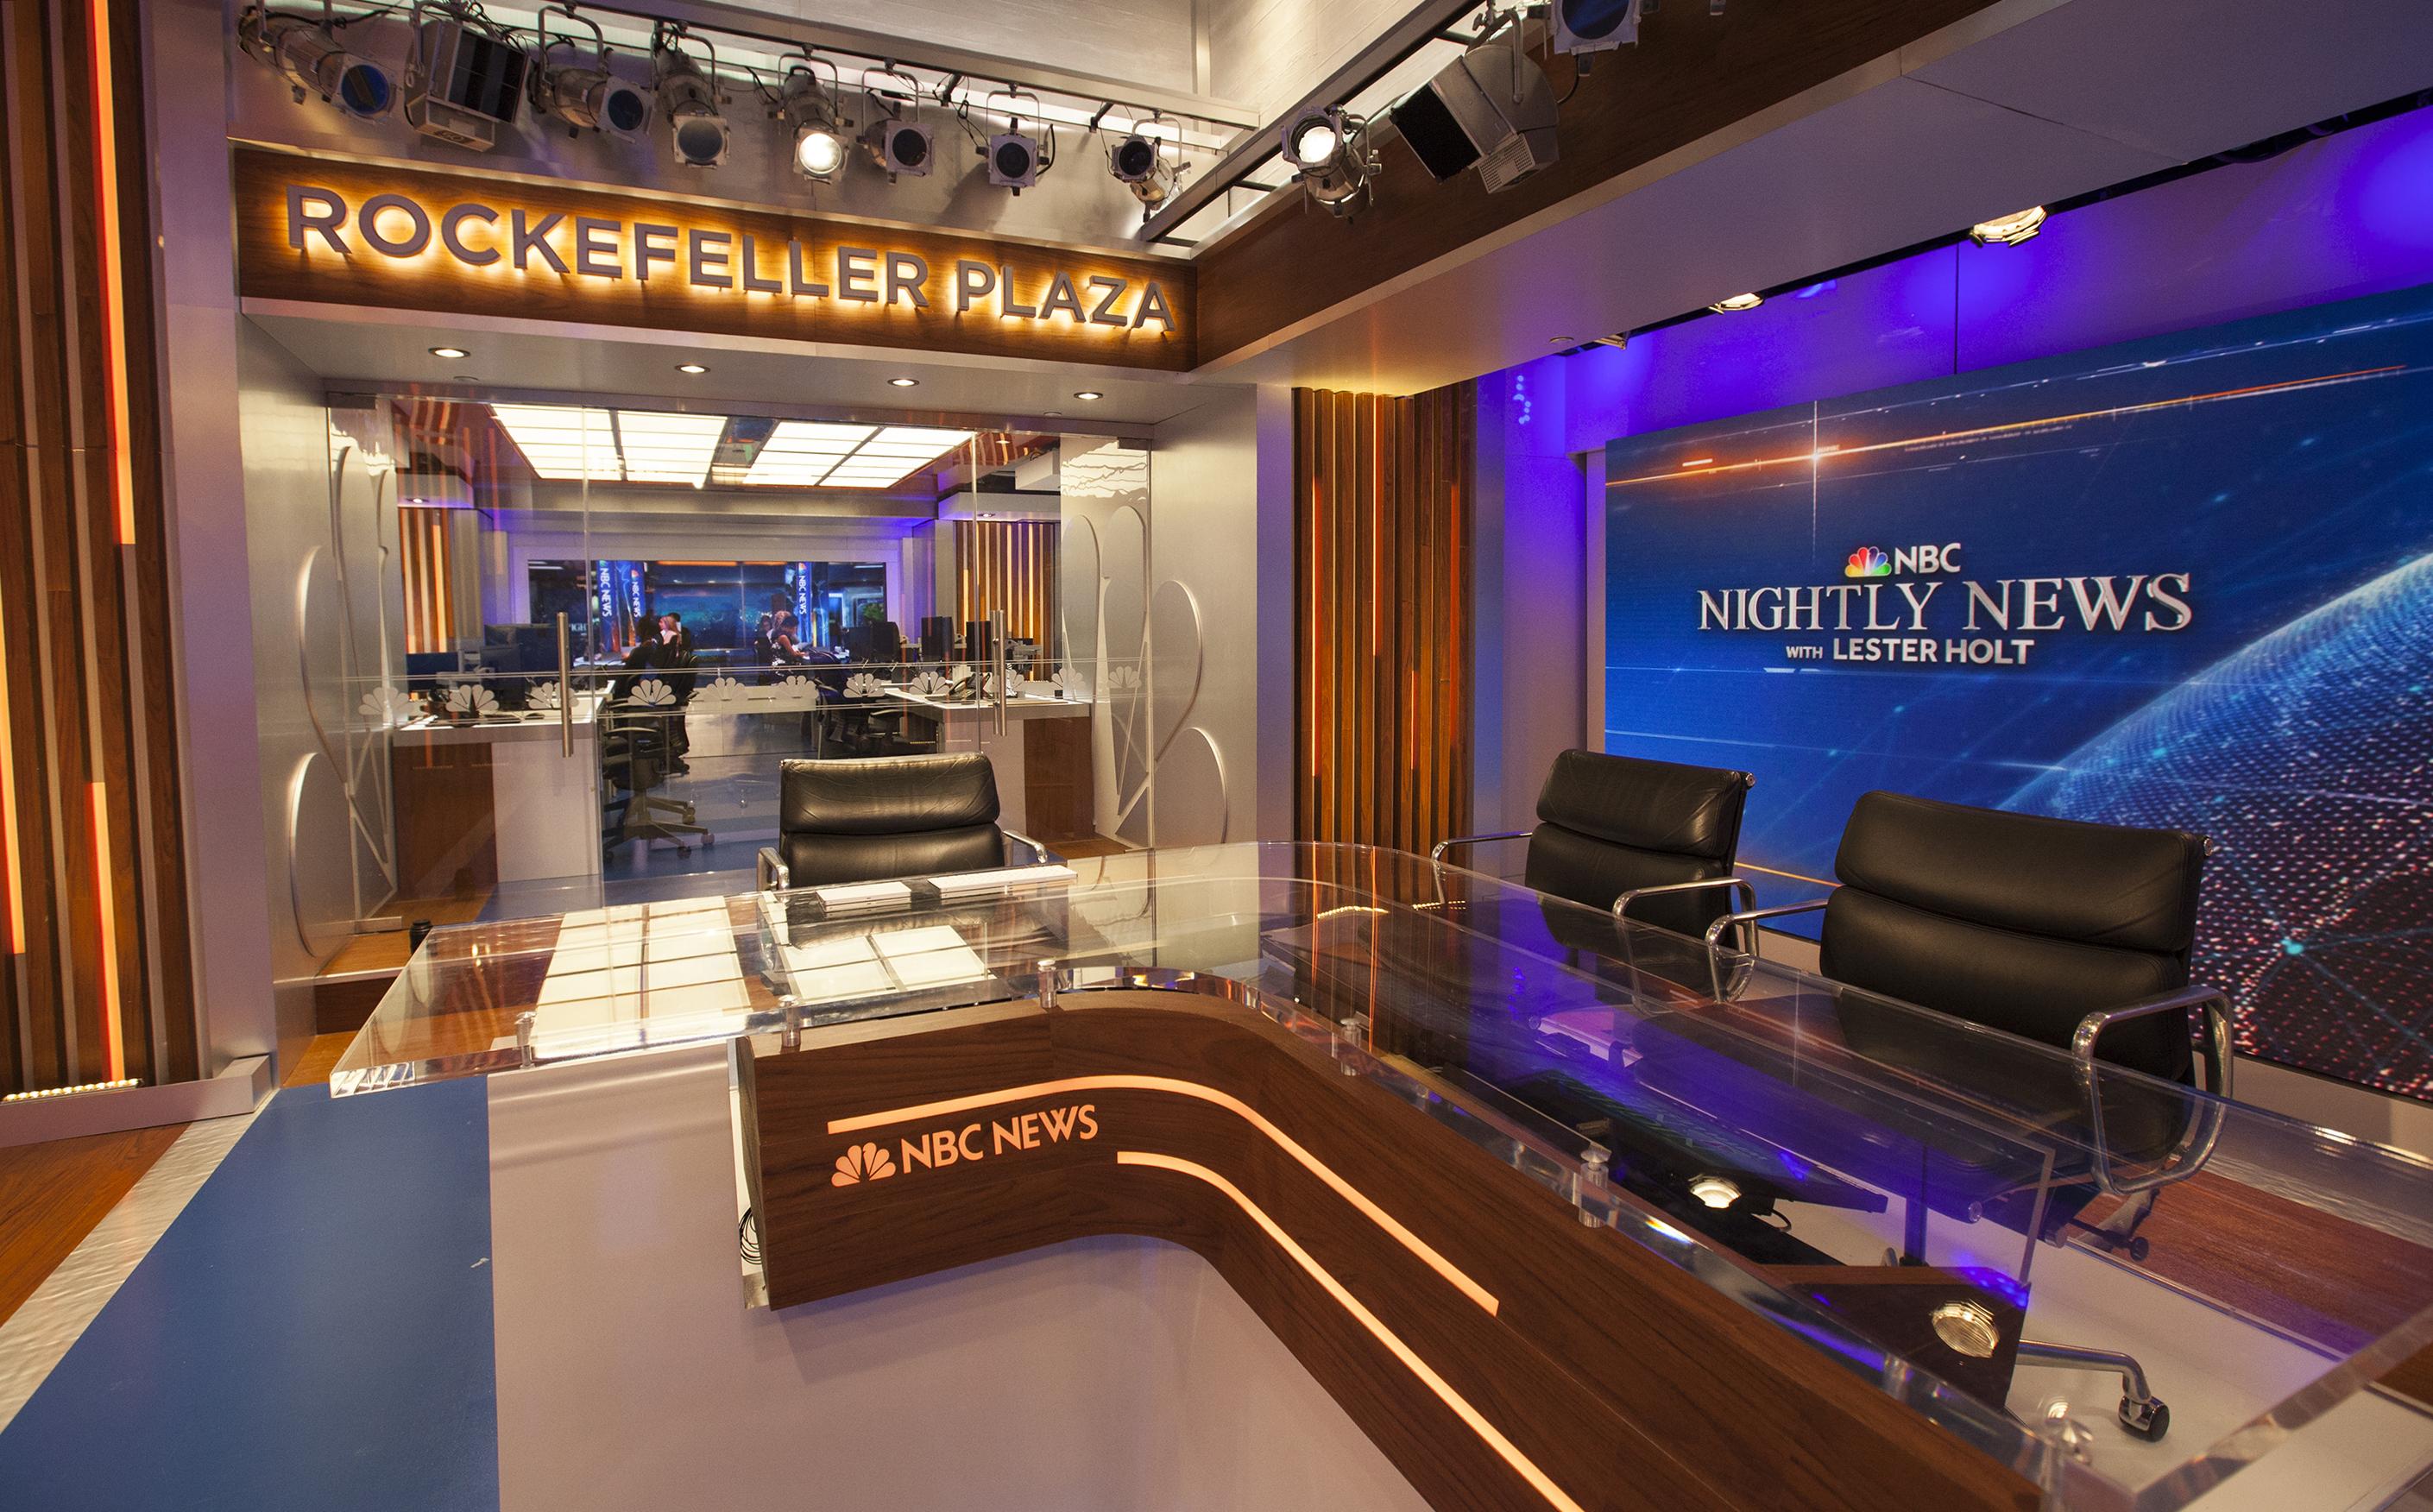 Nbc Nightly News Names New Executive Producer